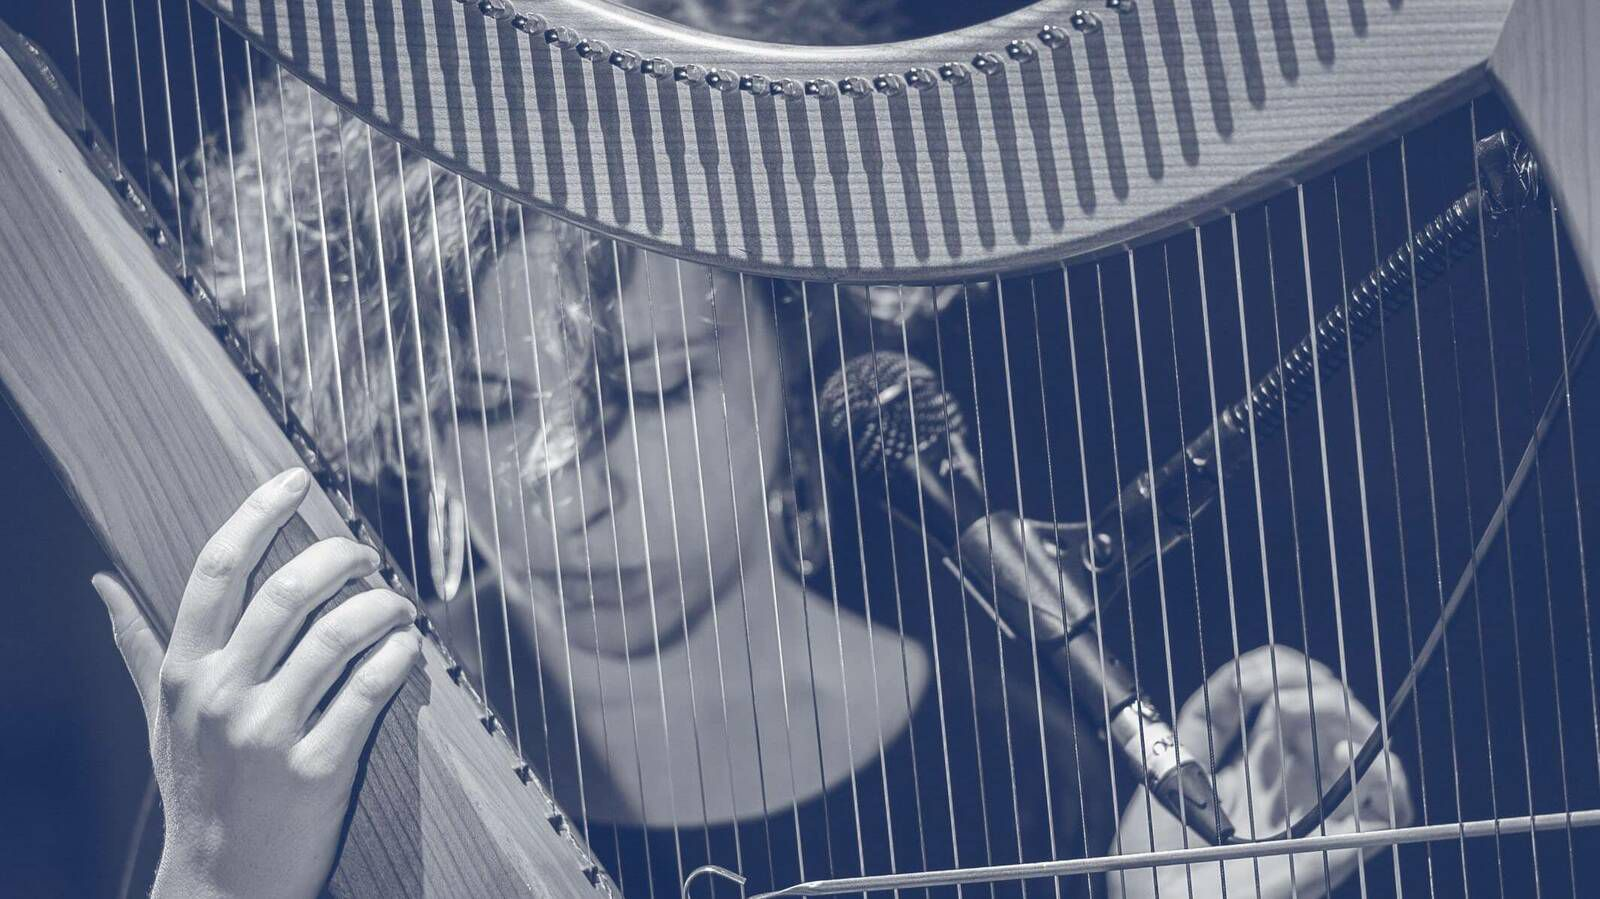 Jazz Actuel, Laura Perrudin, Concert, Perpectives, Avatars